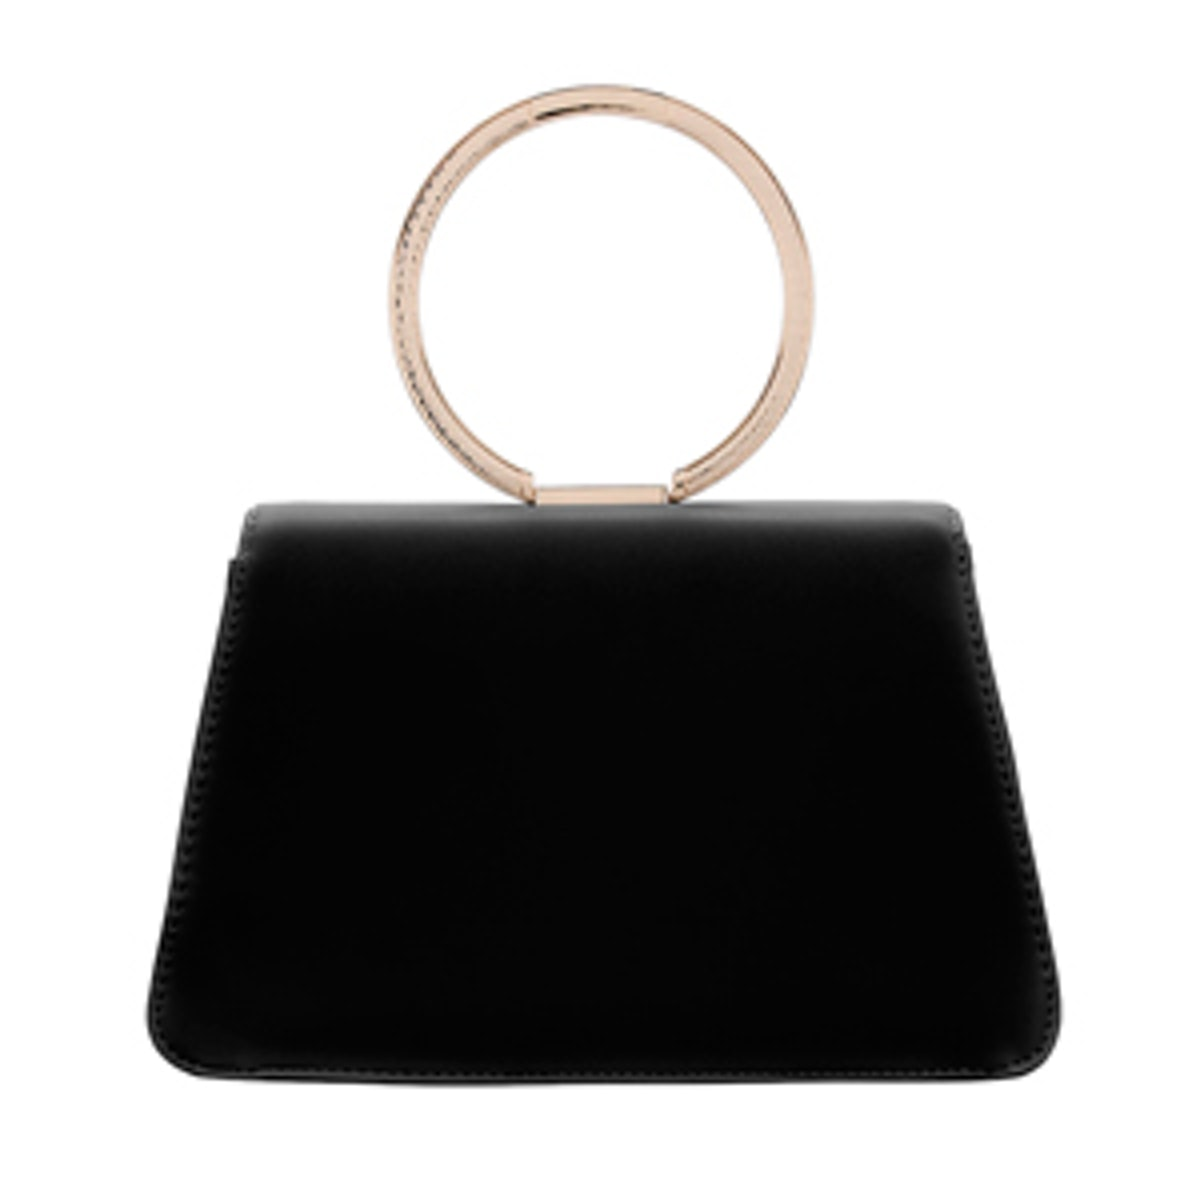 Black Magnetic Chain Satchel Bag